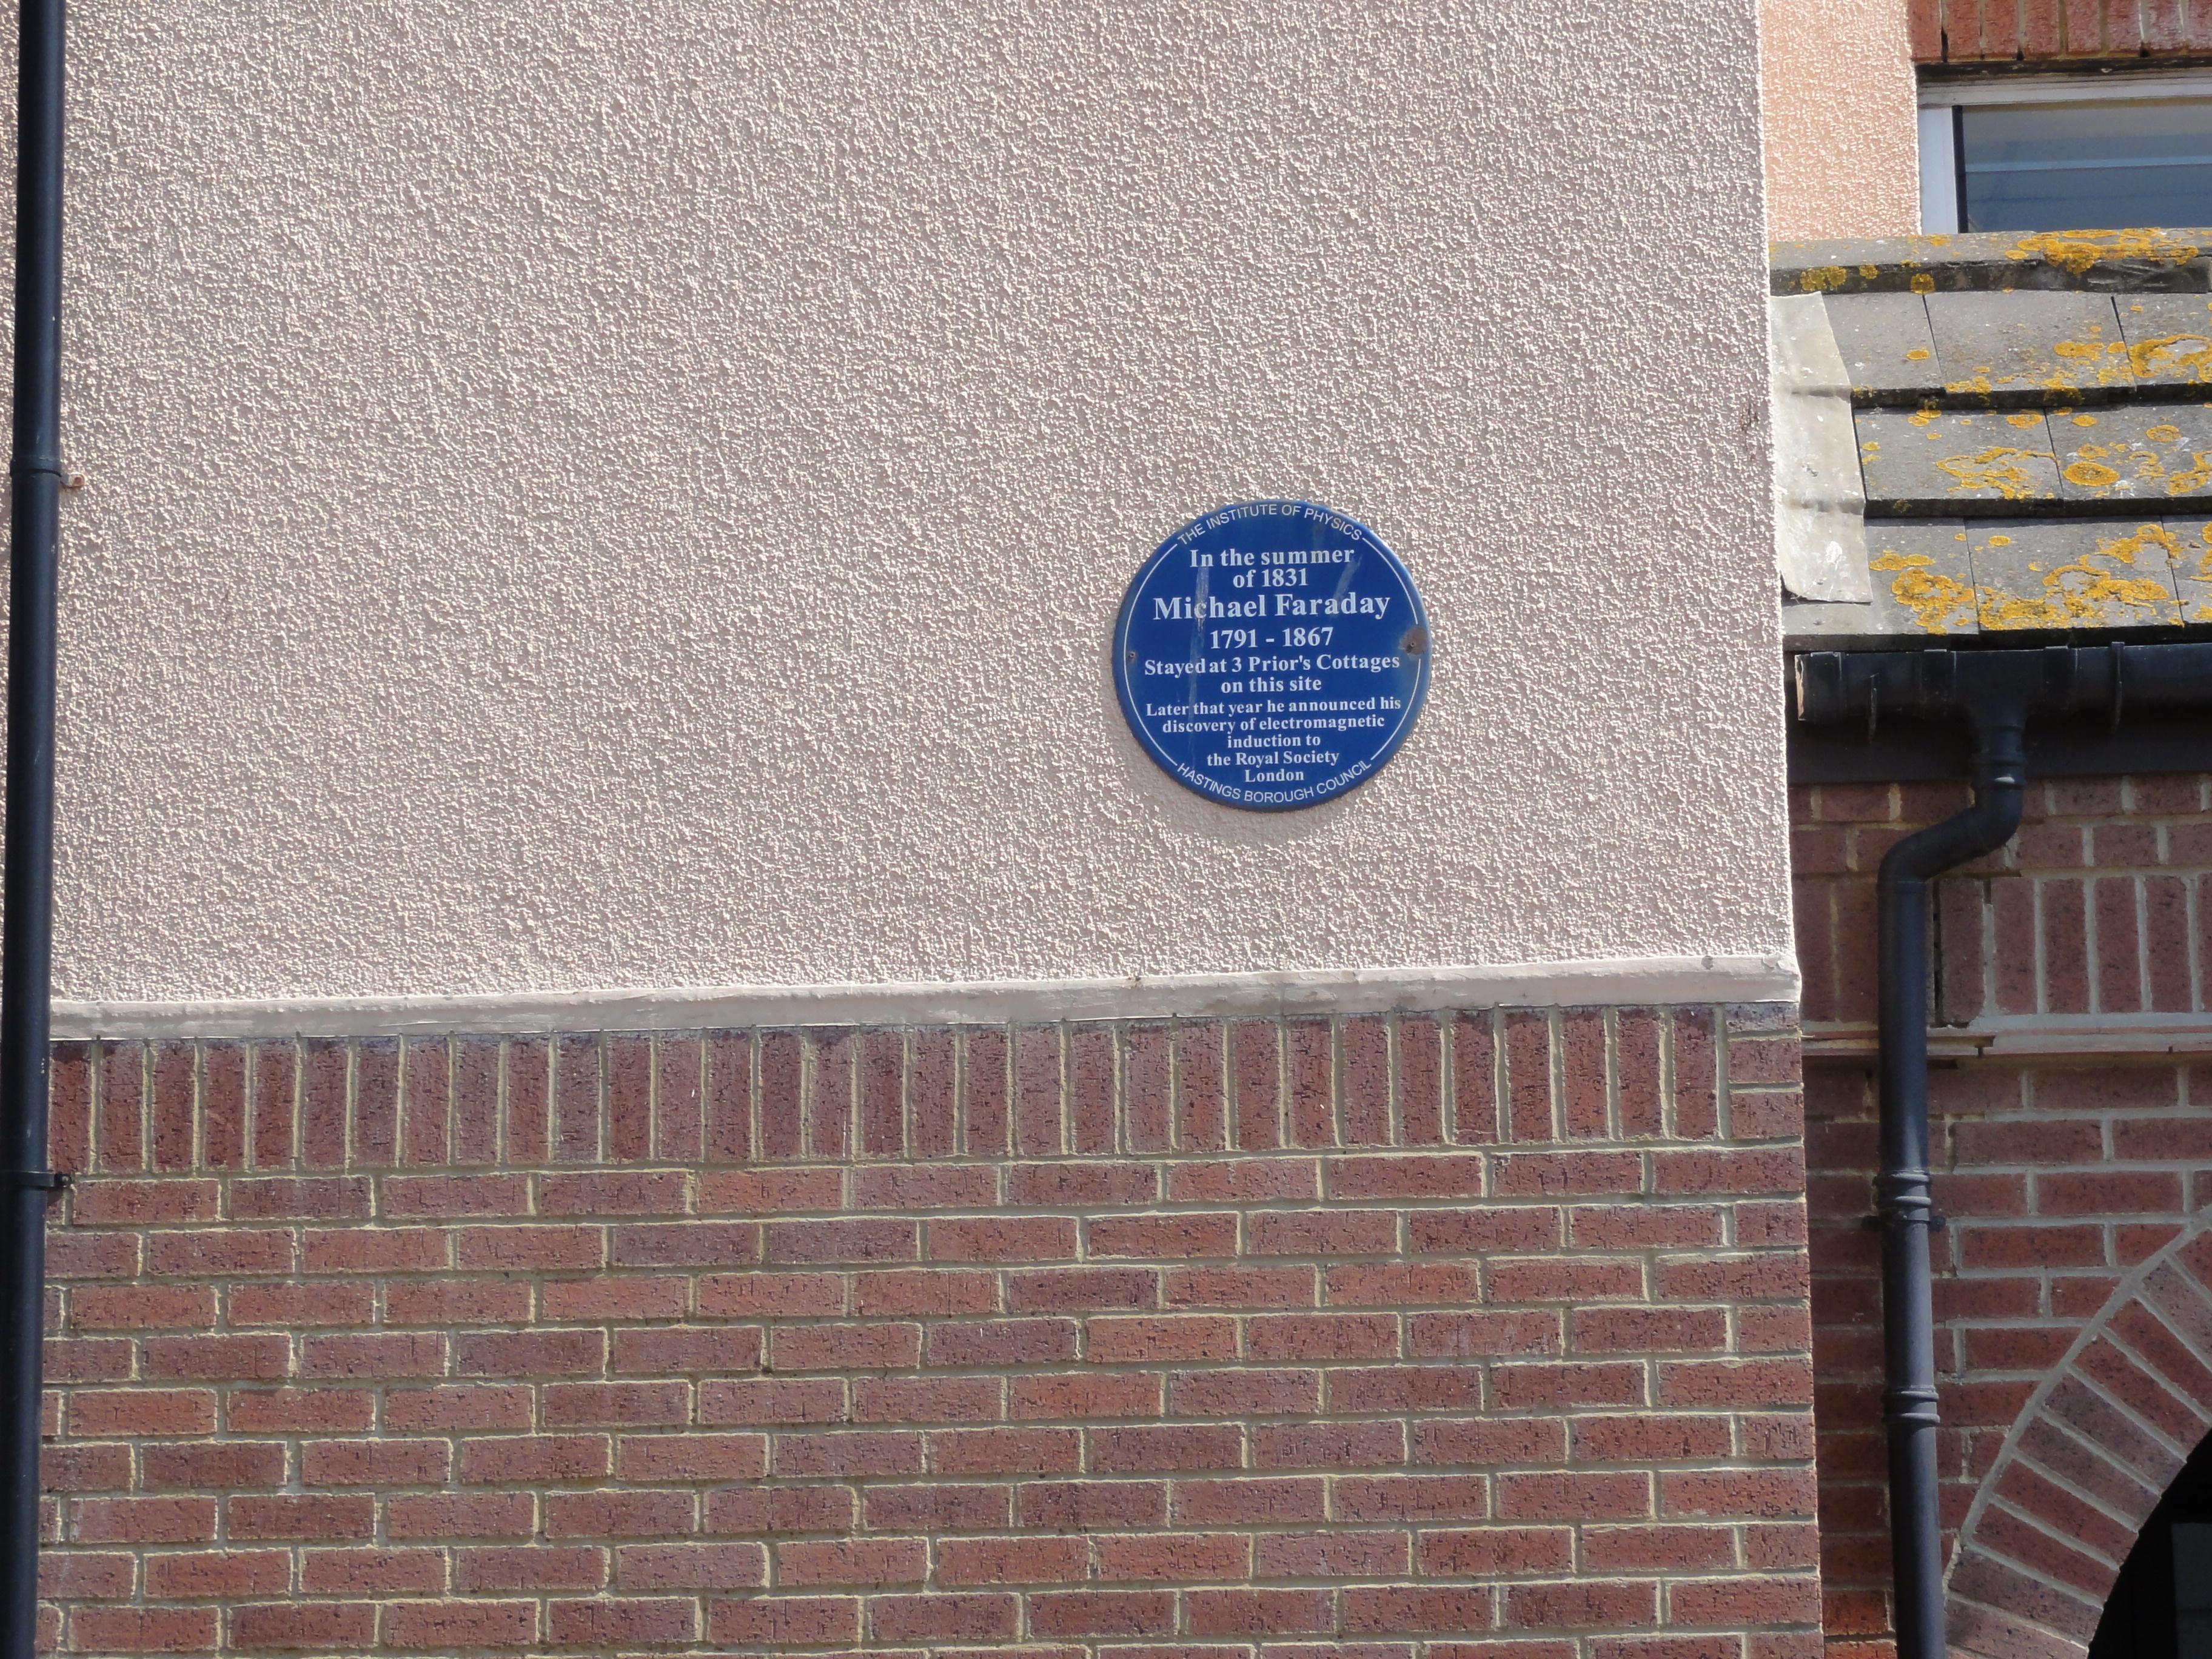 Faraday plaque hastings